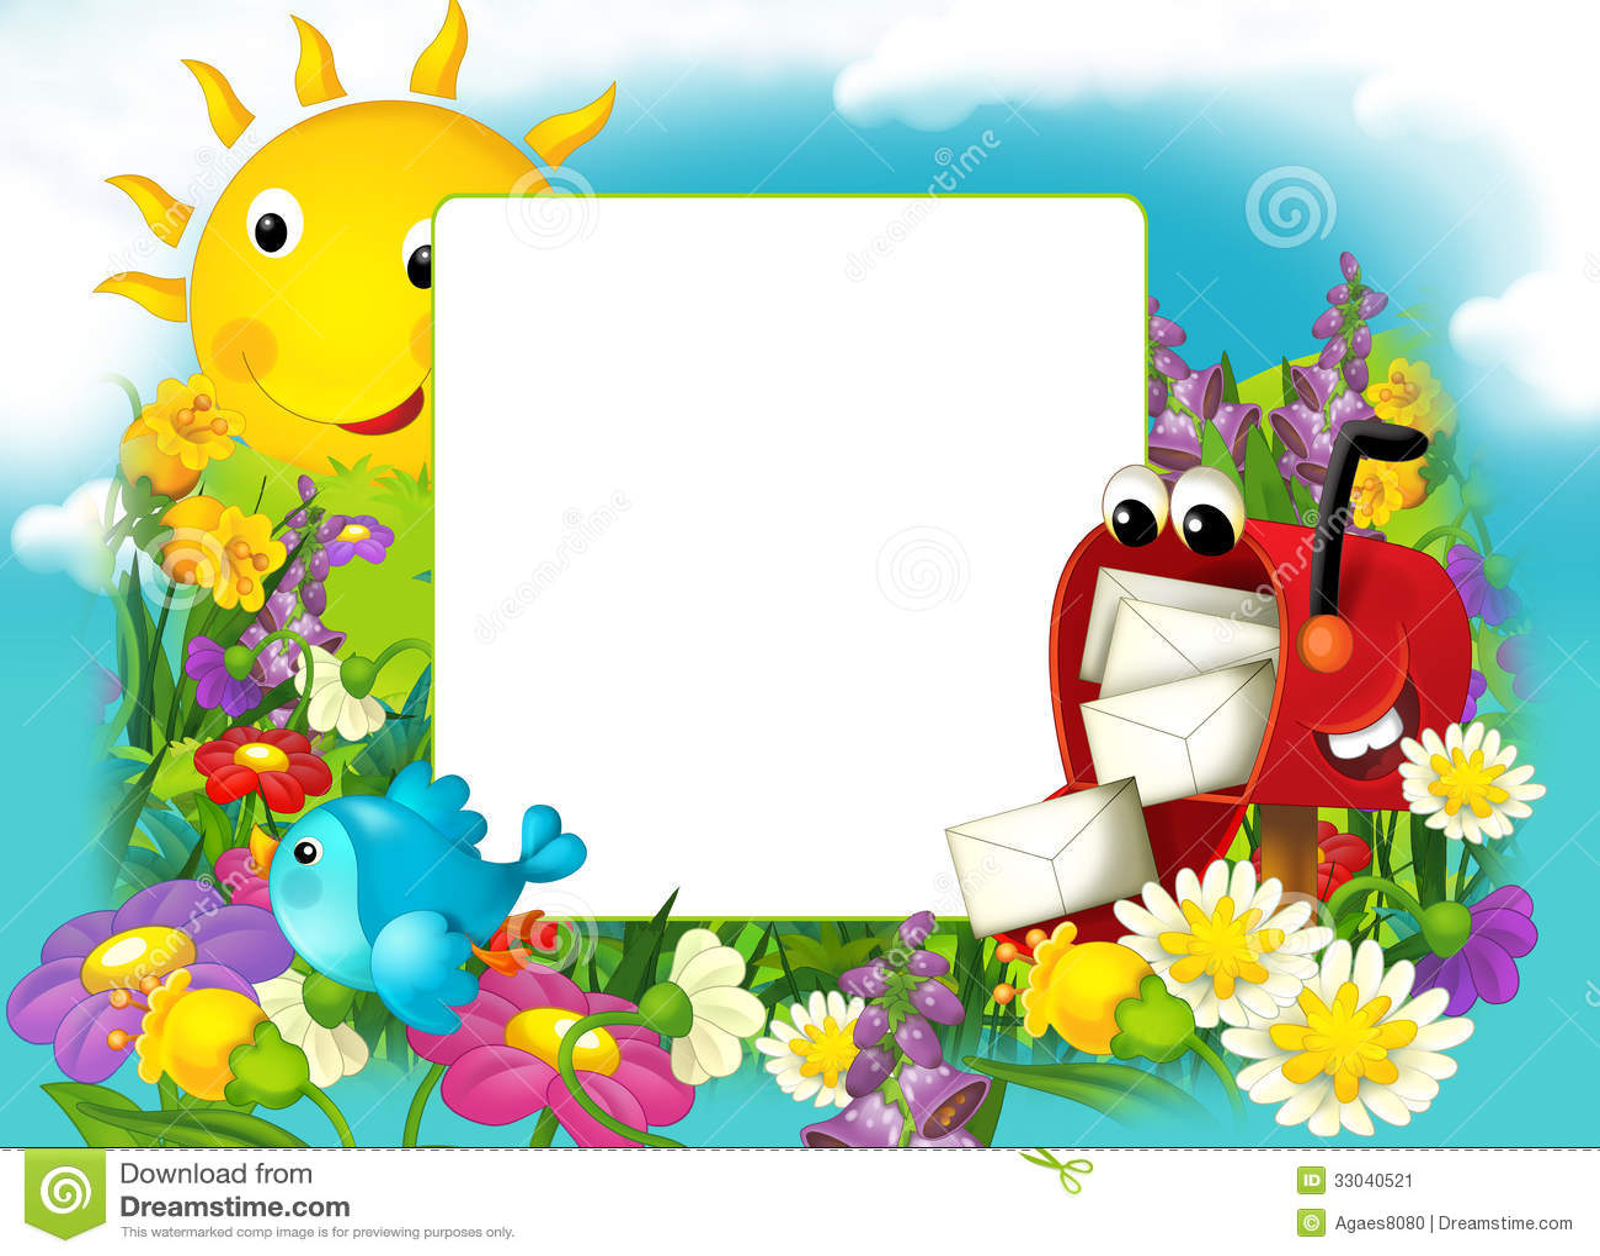 marcos para diplomas infantiles - Ideal.vistalist.co